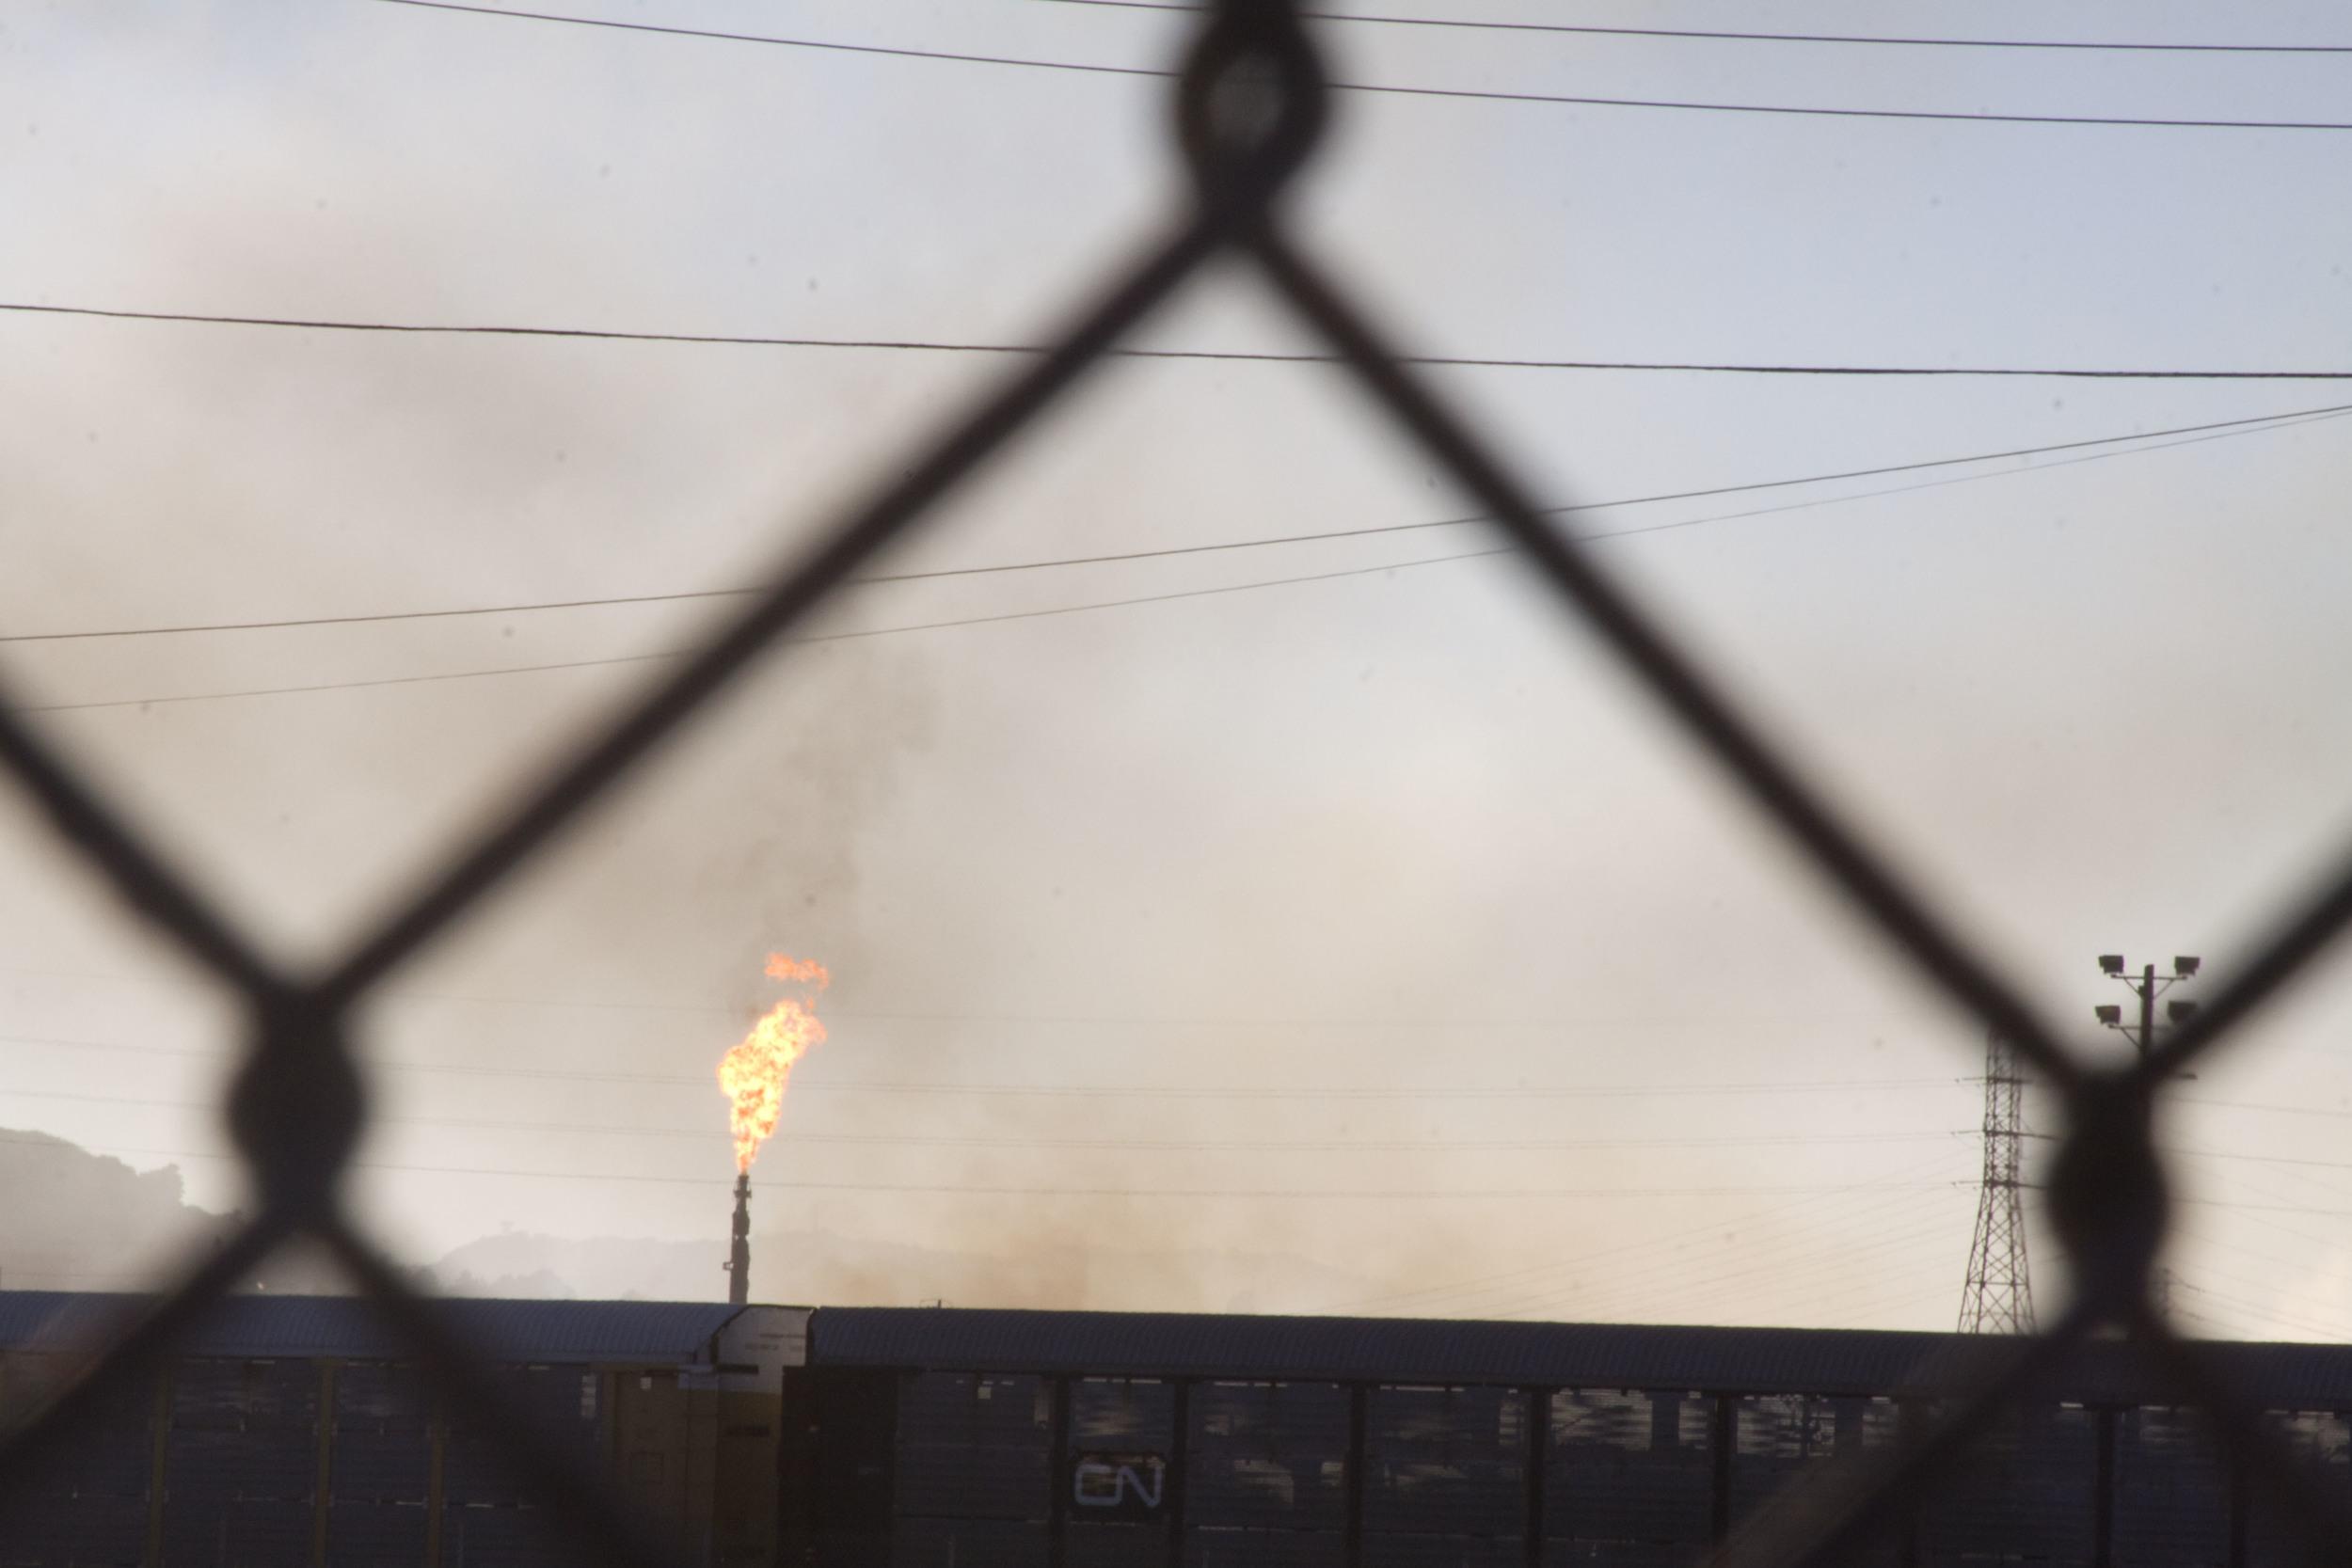 Refinery fire_48.jpg